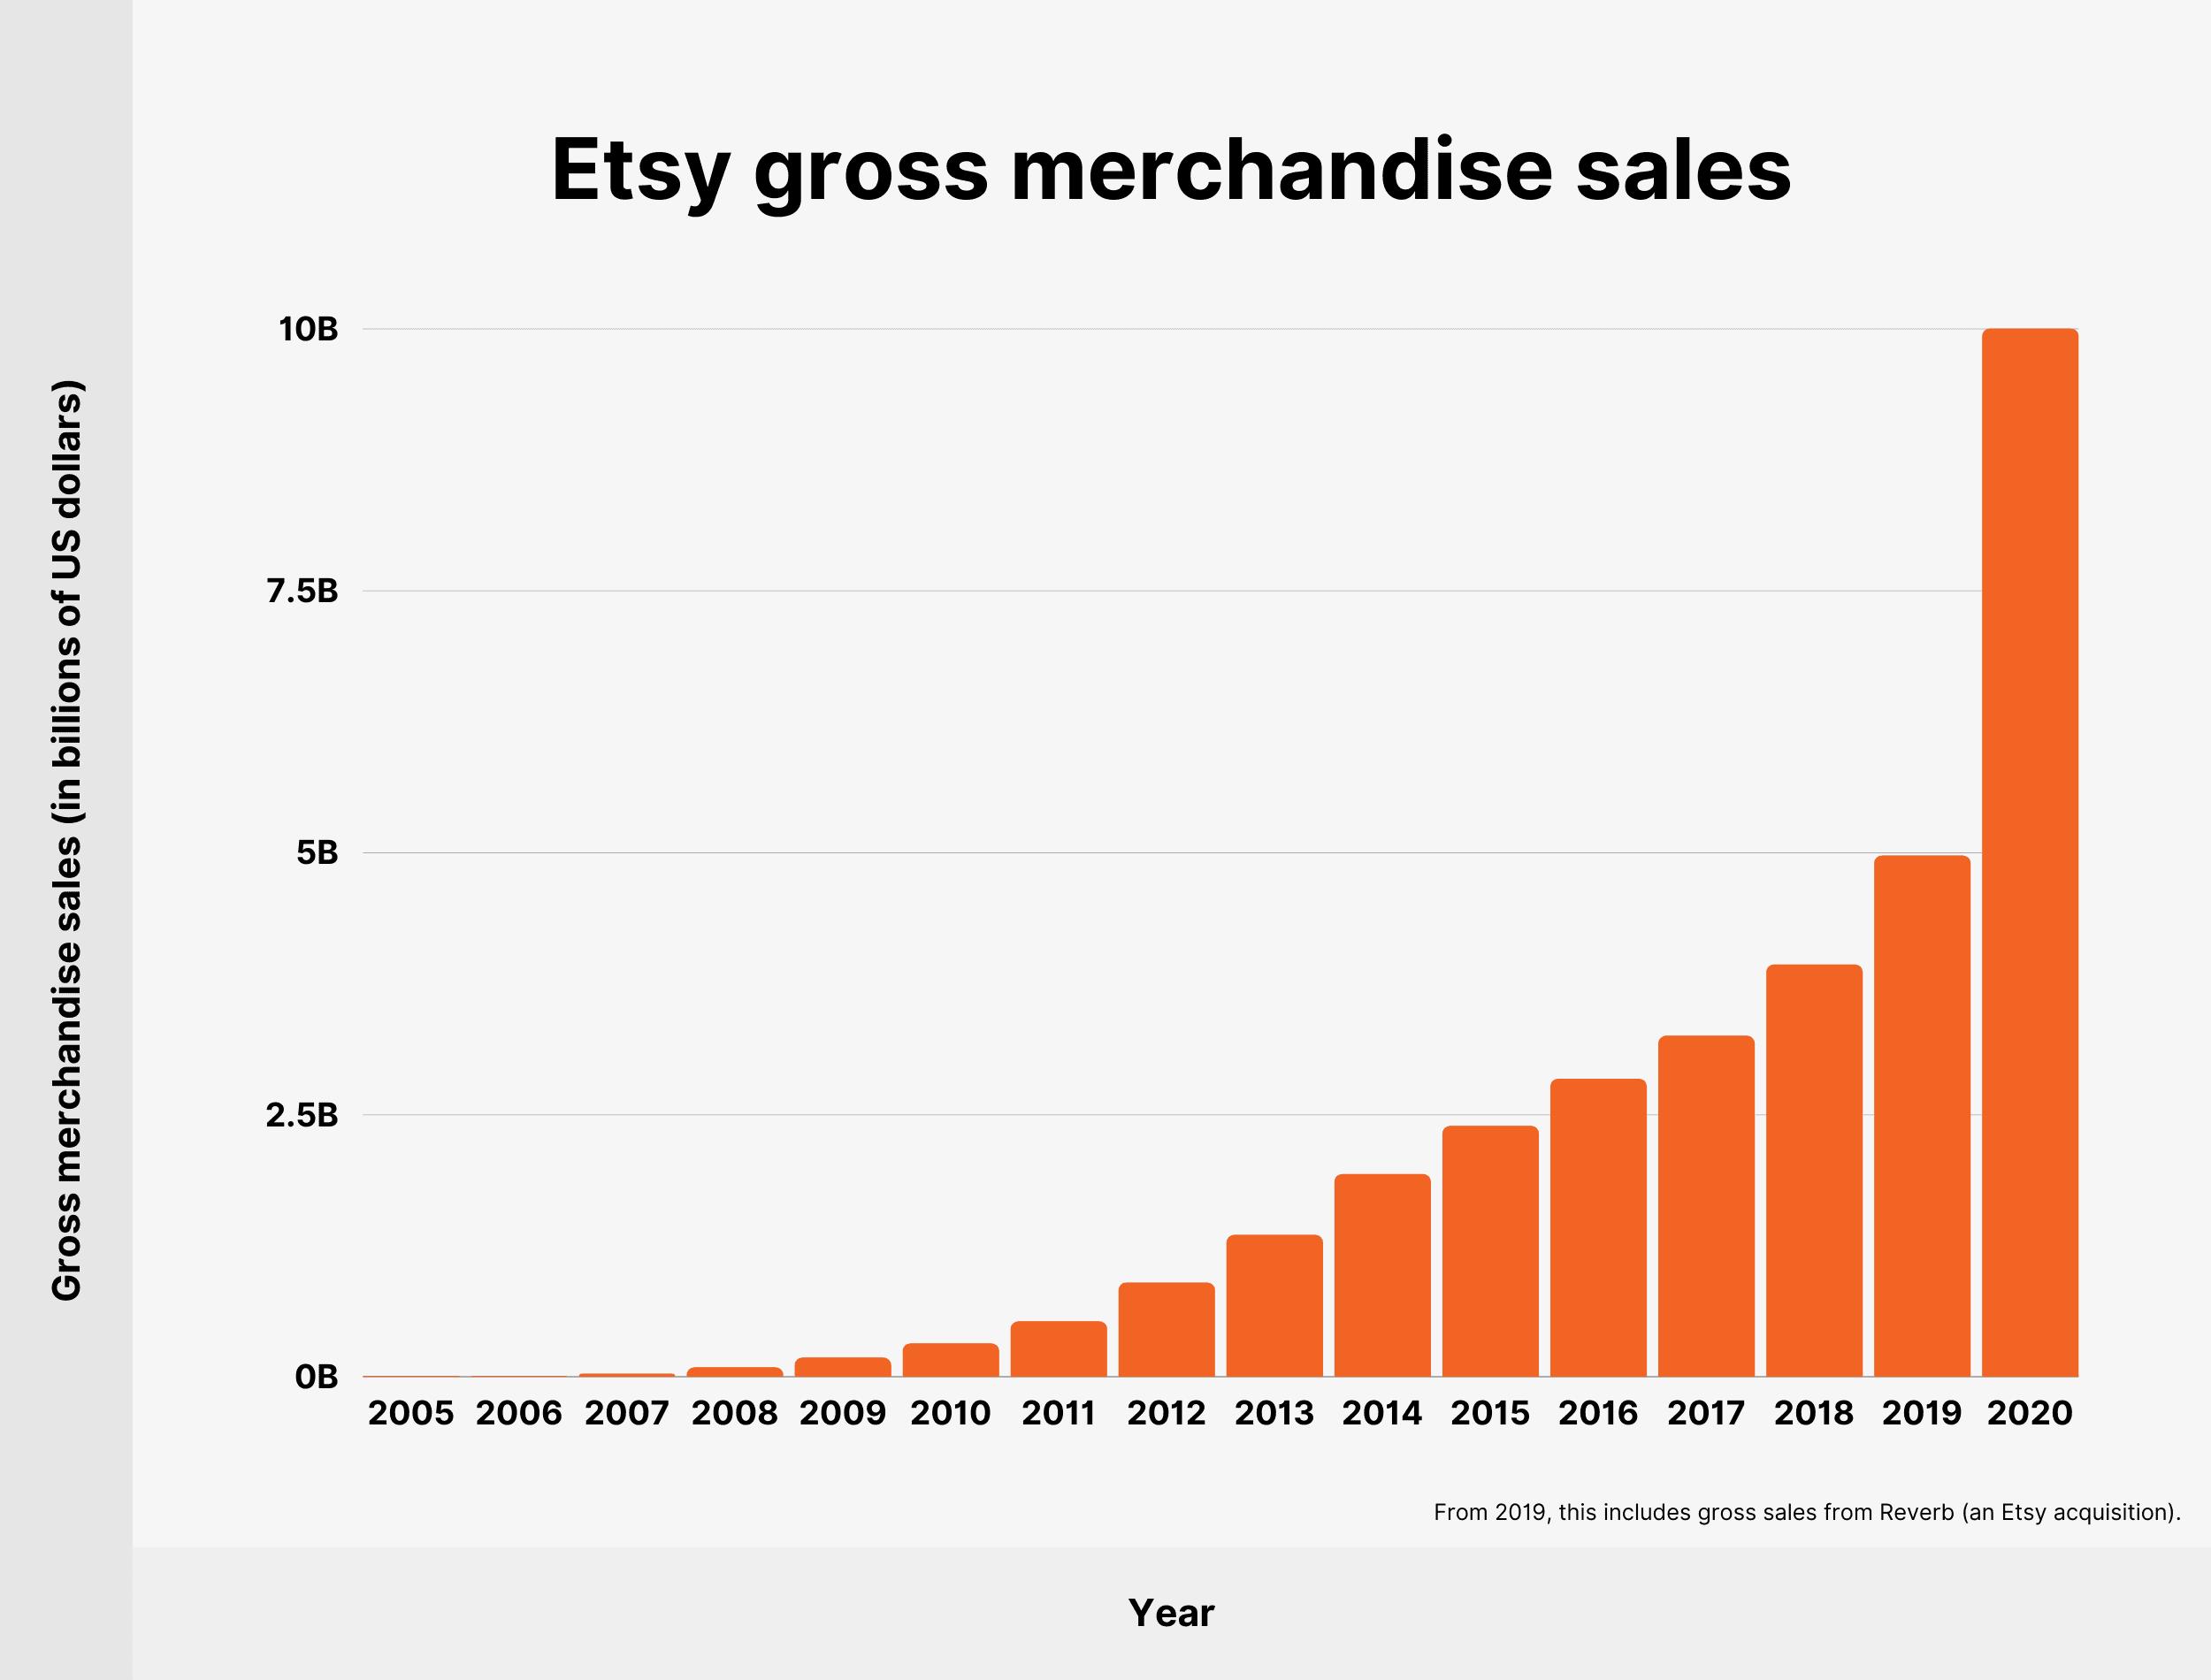 Etsy gross merchandise sales